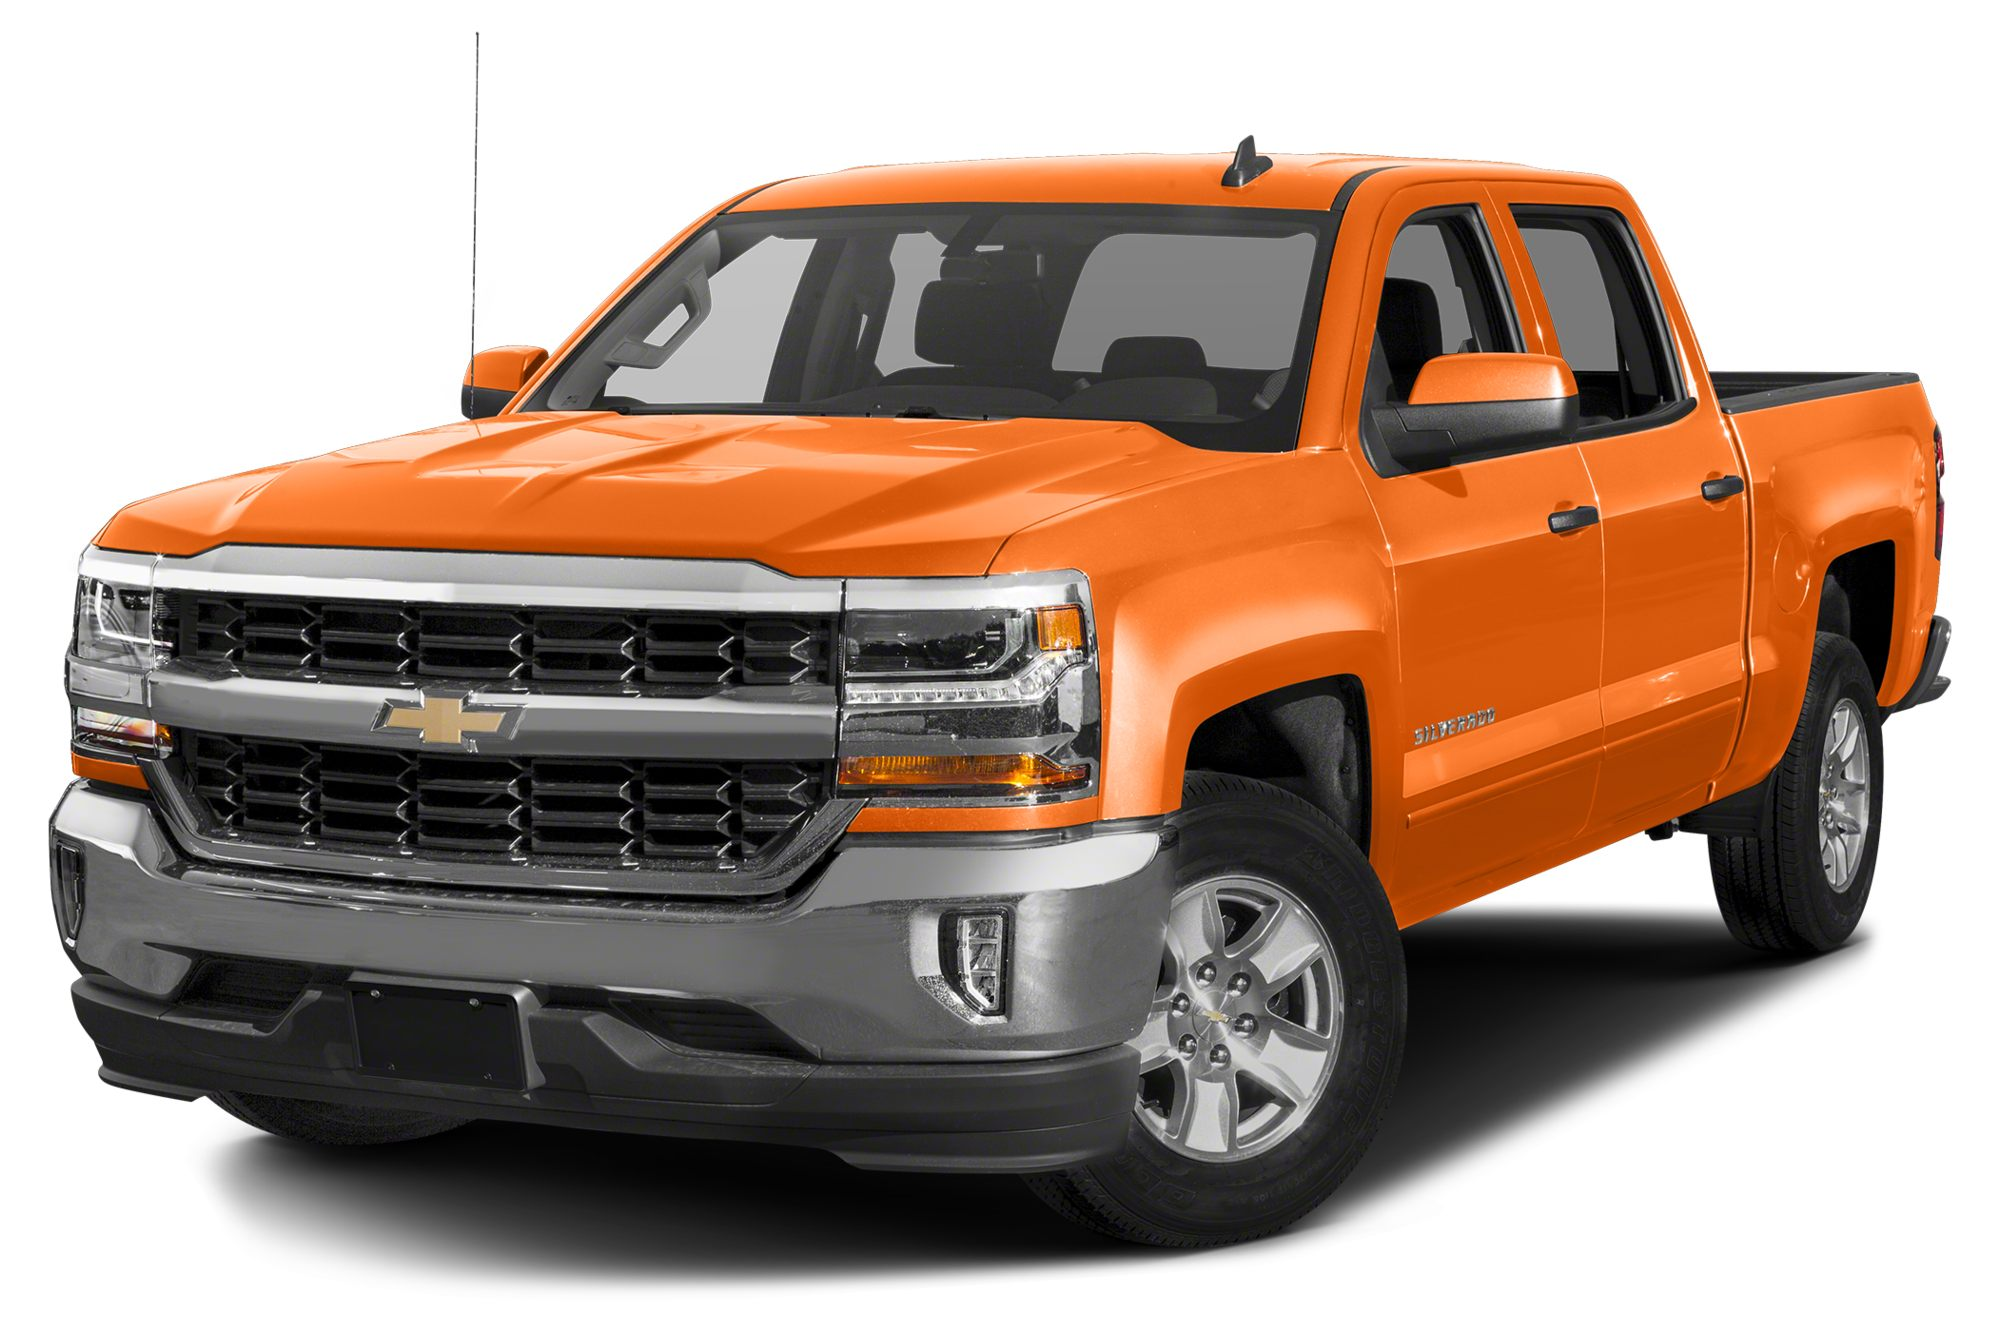 638,000 Chevrolet and GMC SUVs and Pickup Trucks: Recall Alert